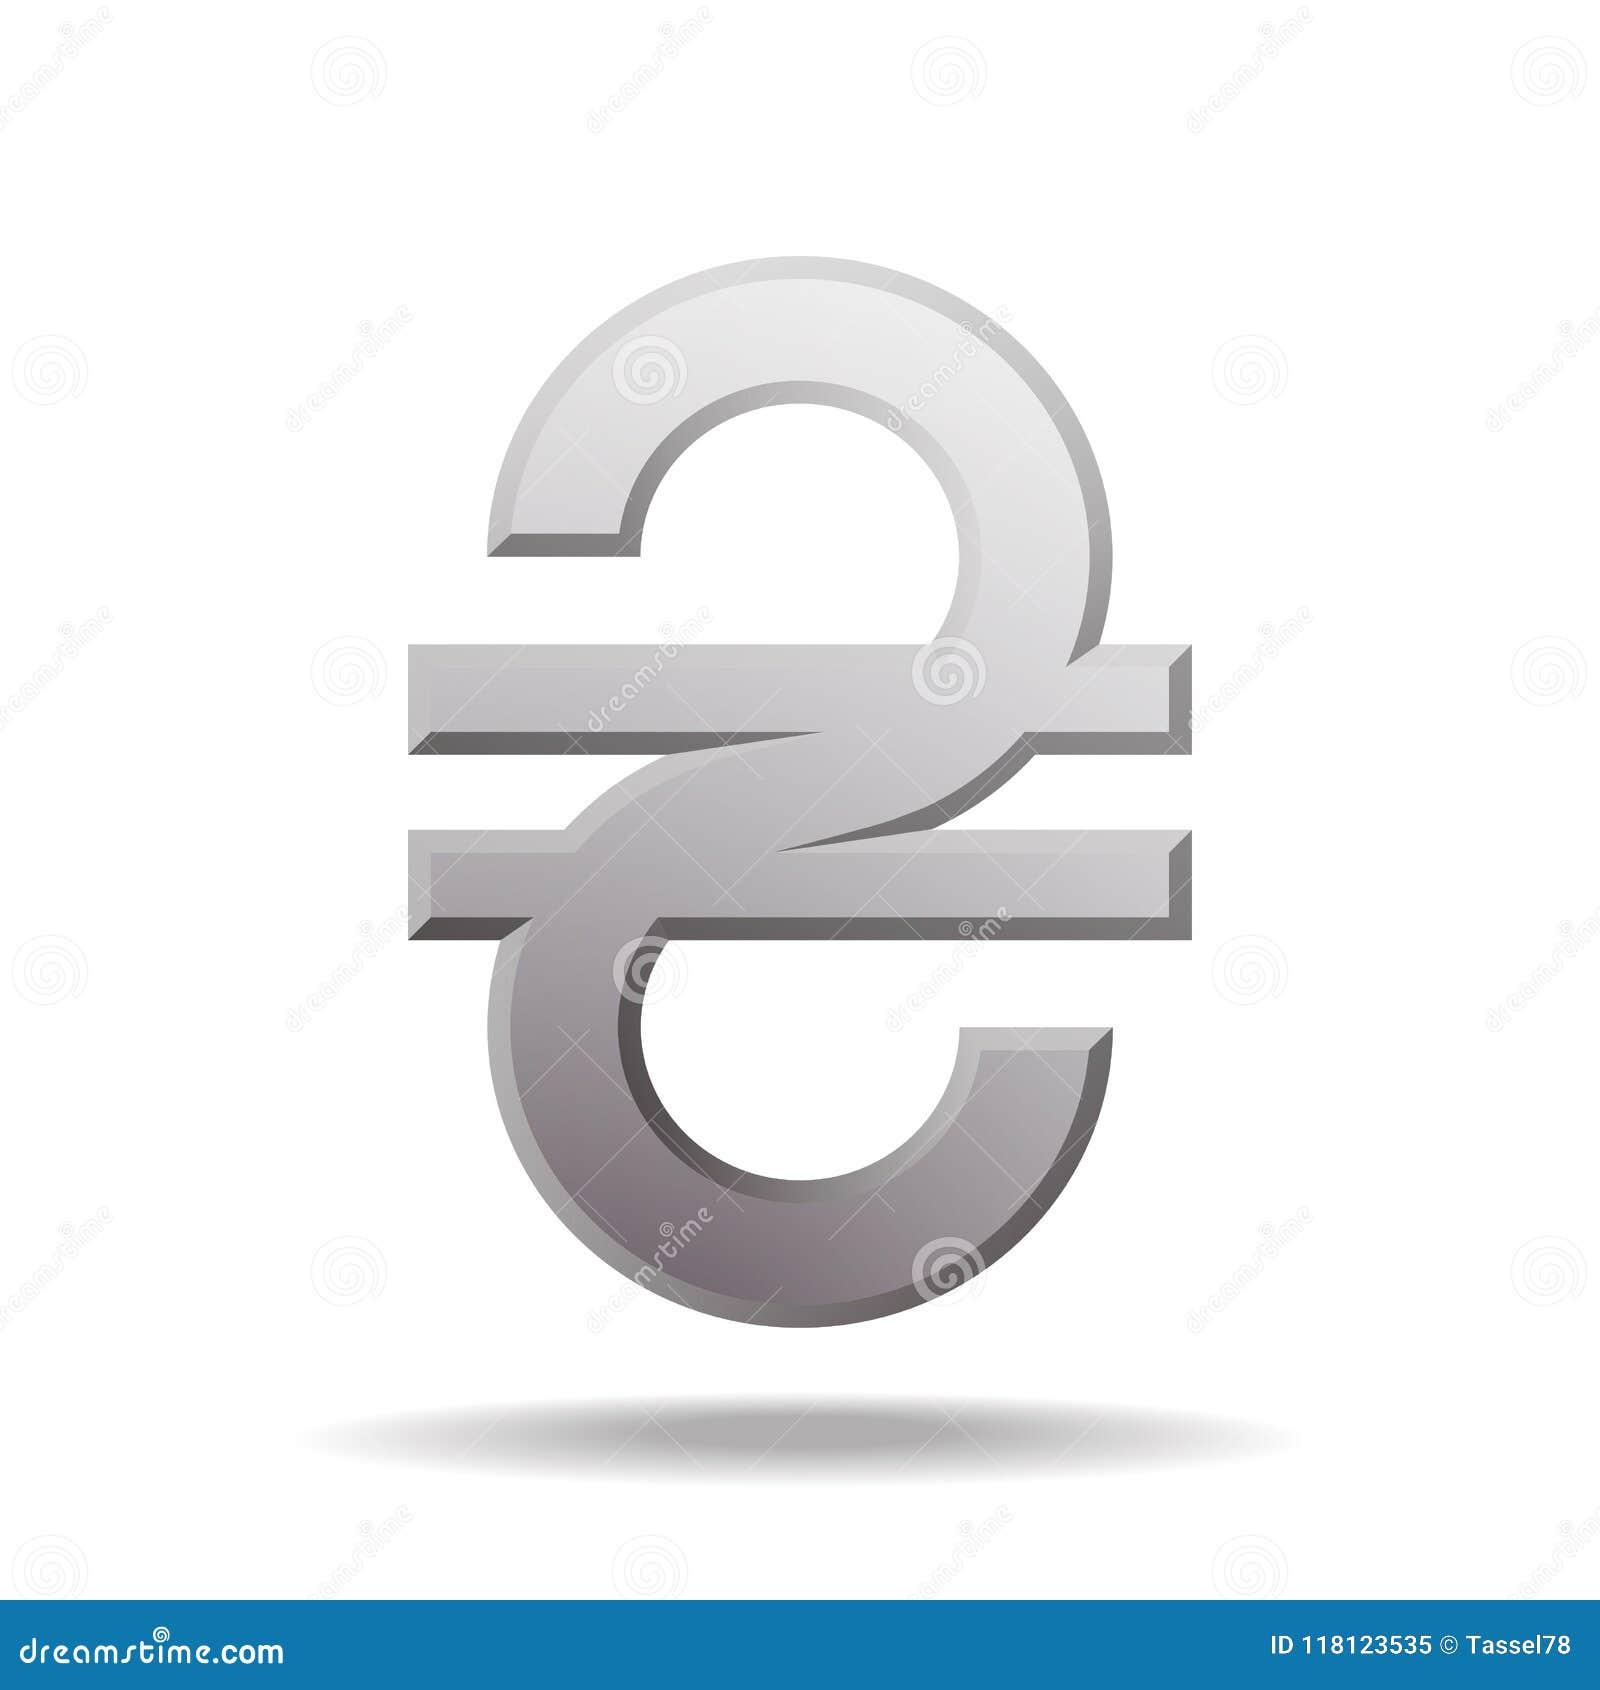 Ukrainian Hryvnia currency sign